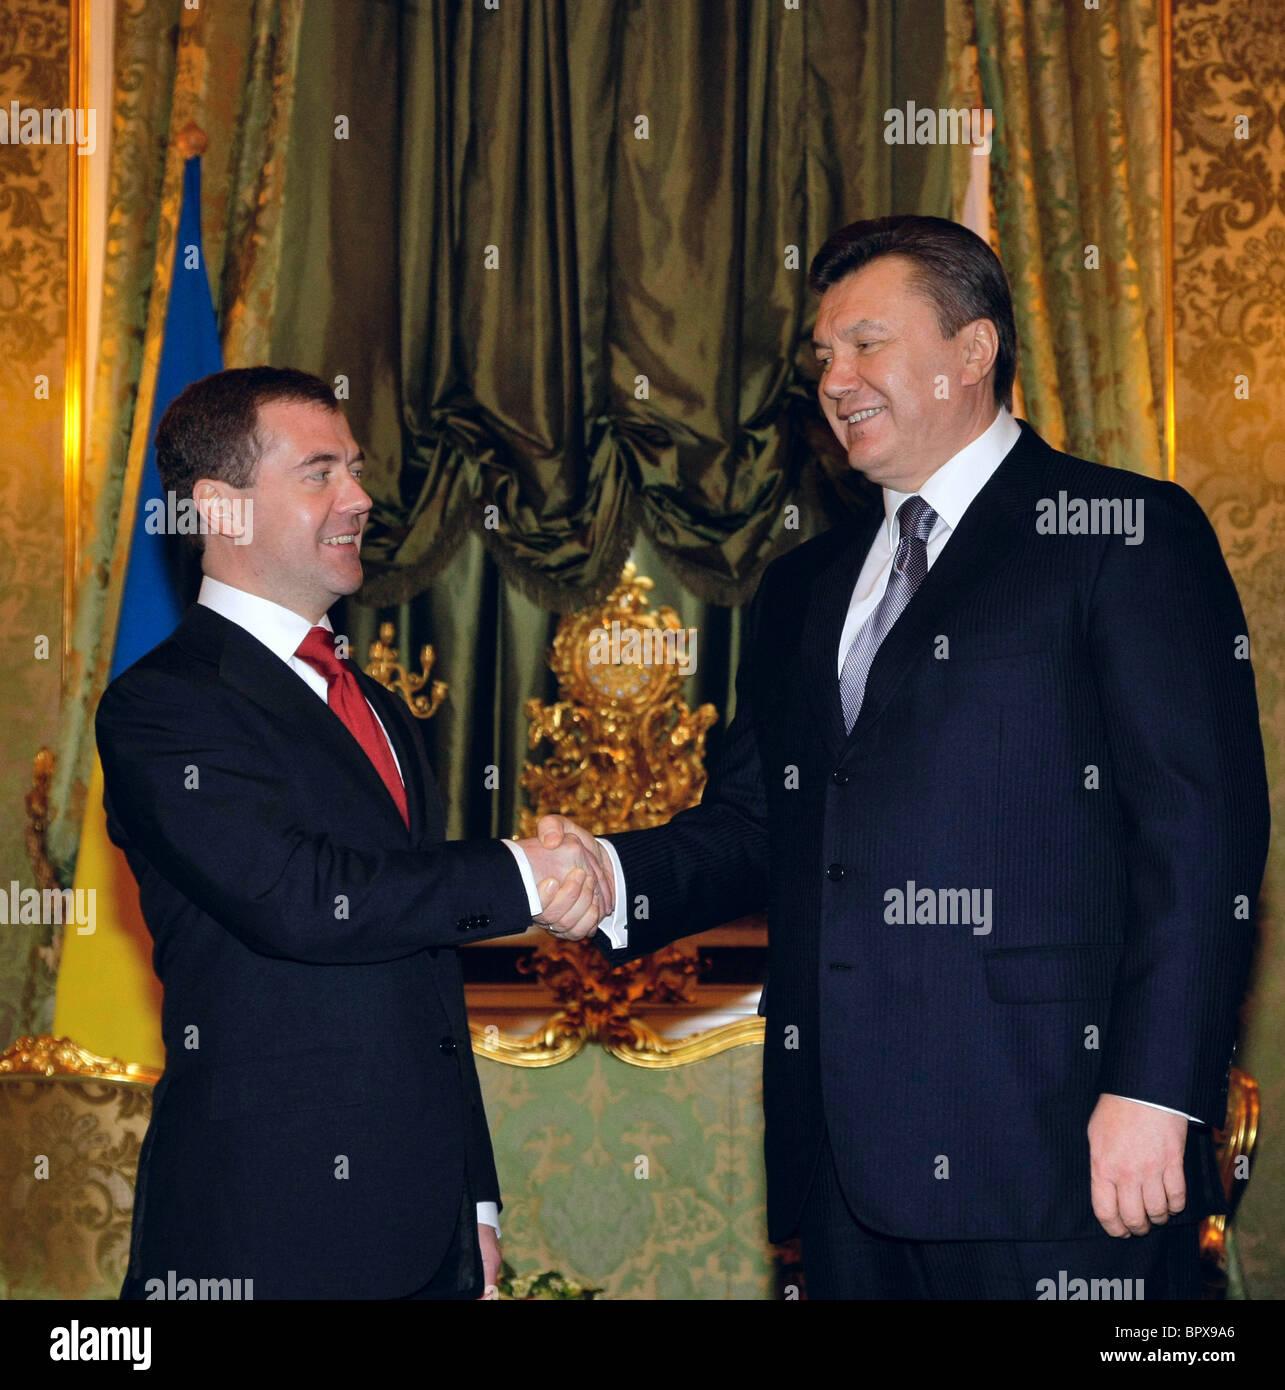 Ukrainian president visits Russia - Stock Image